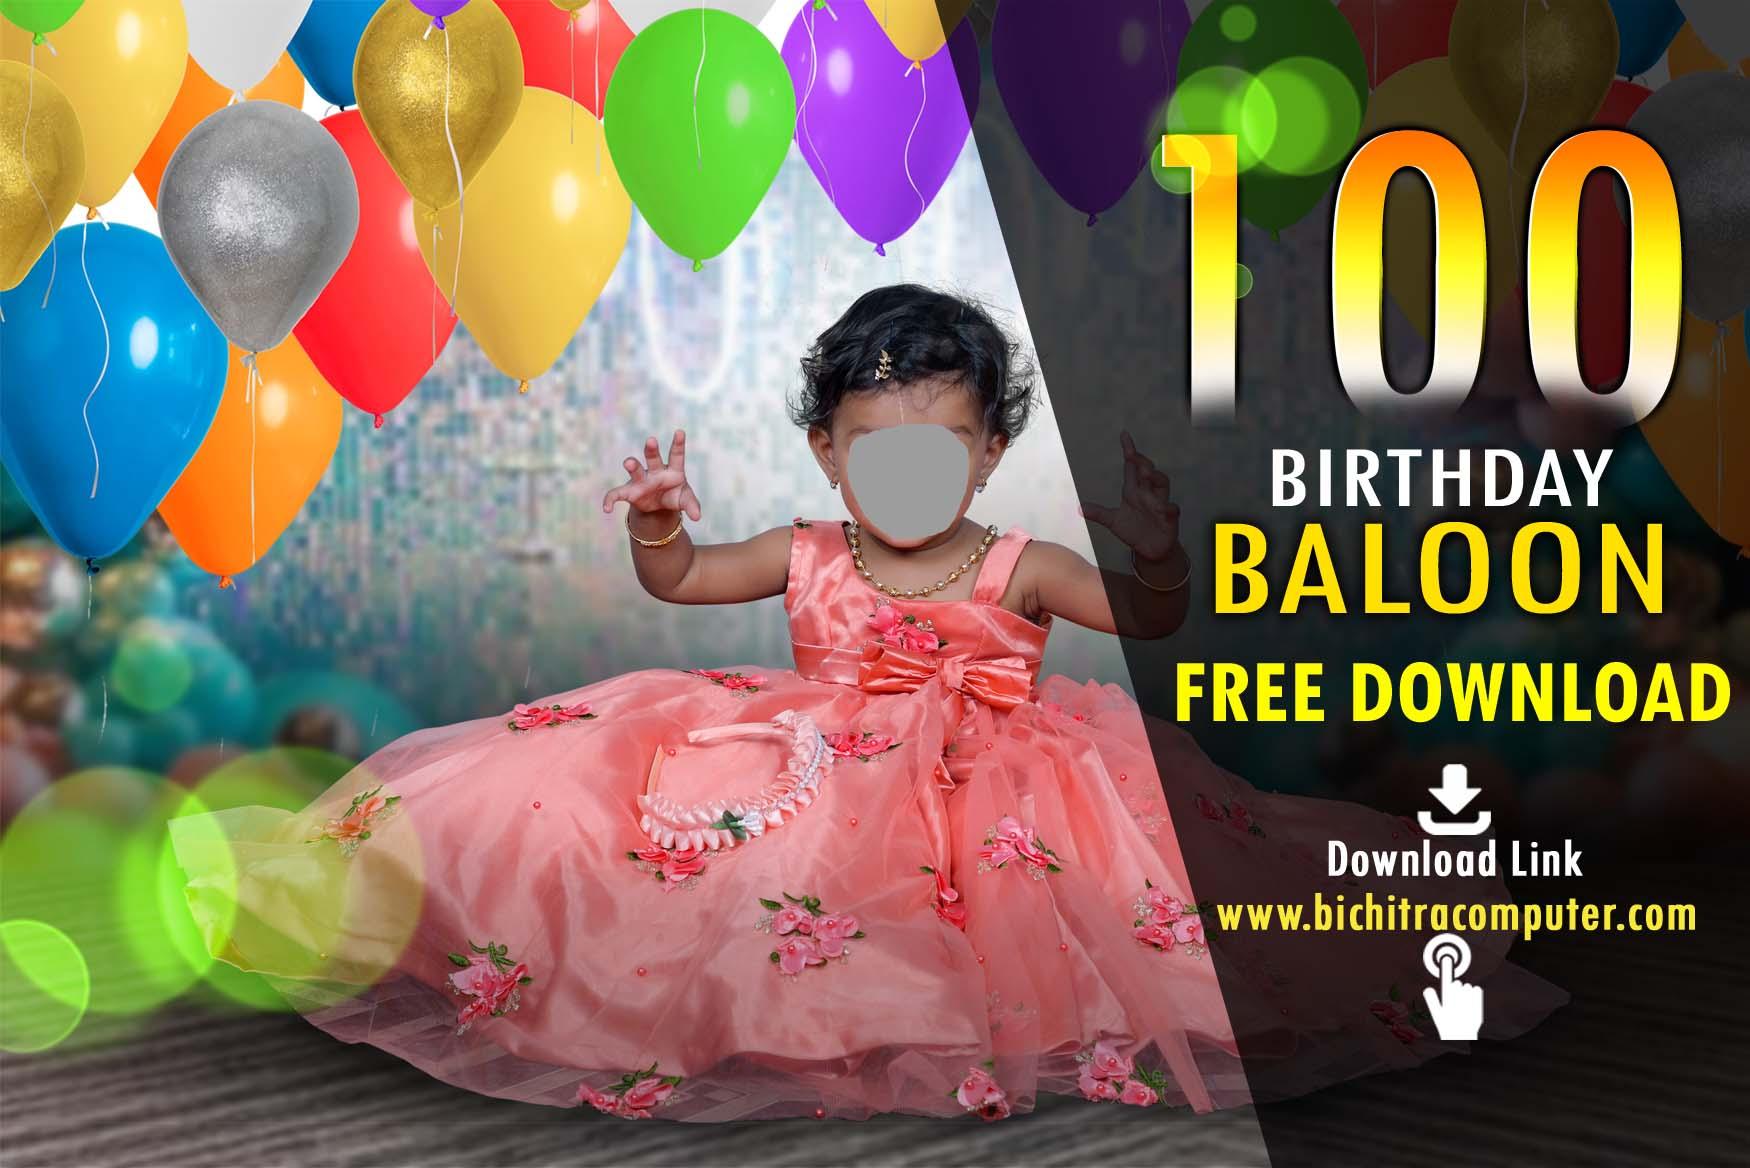 Birthday Baloon, Colourful Balloon